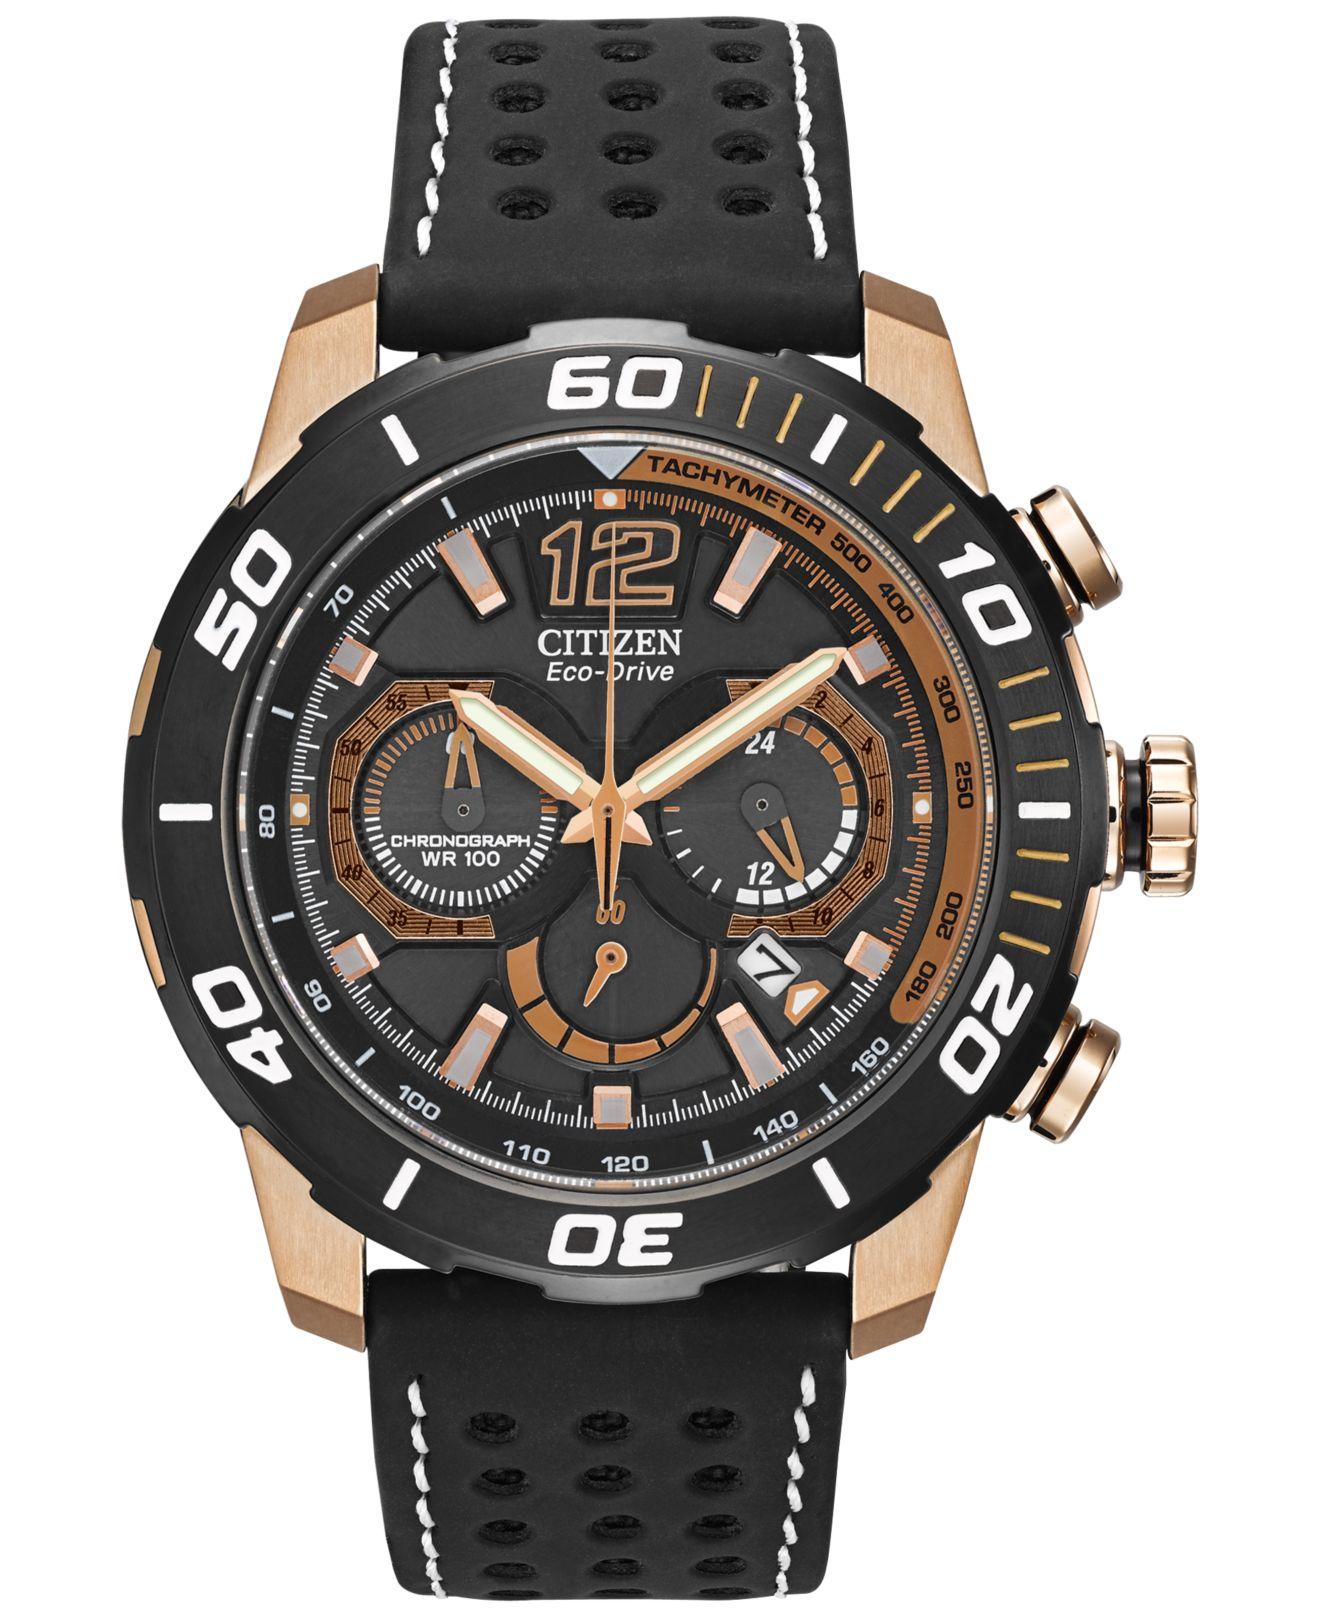 citizen s chronograph eco drive primo black perforated